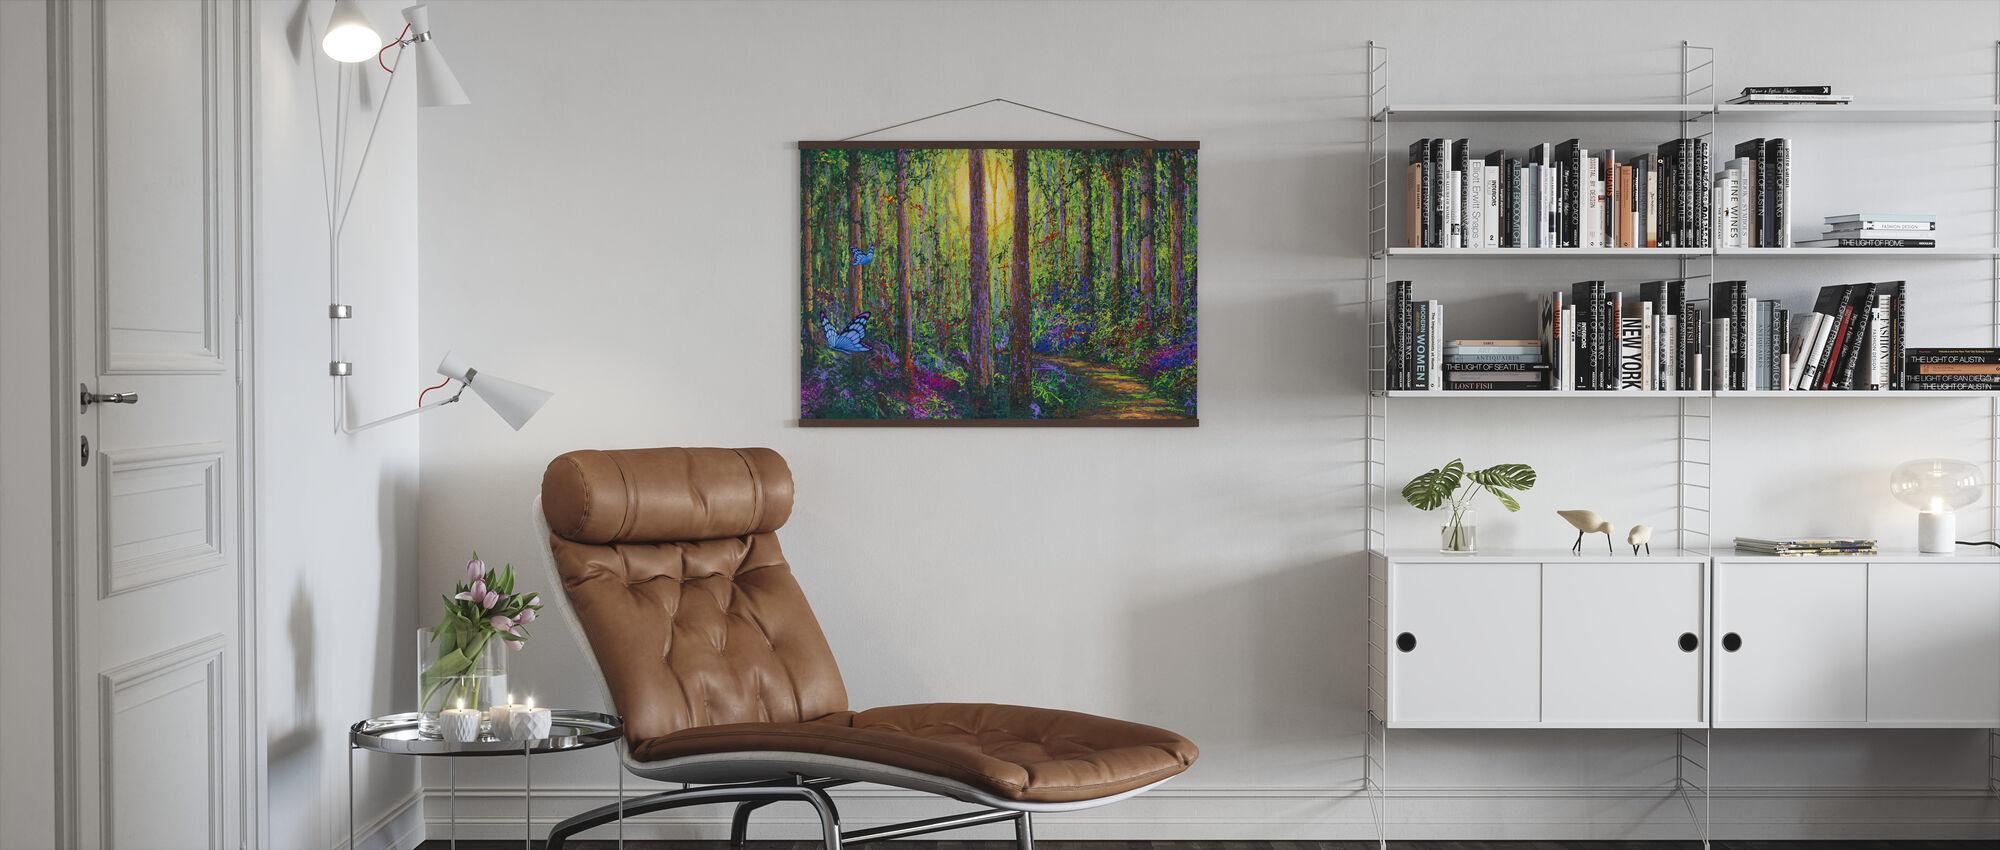 Forest Butterflies - Poster - Living Room